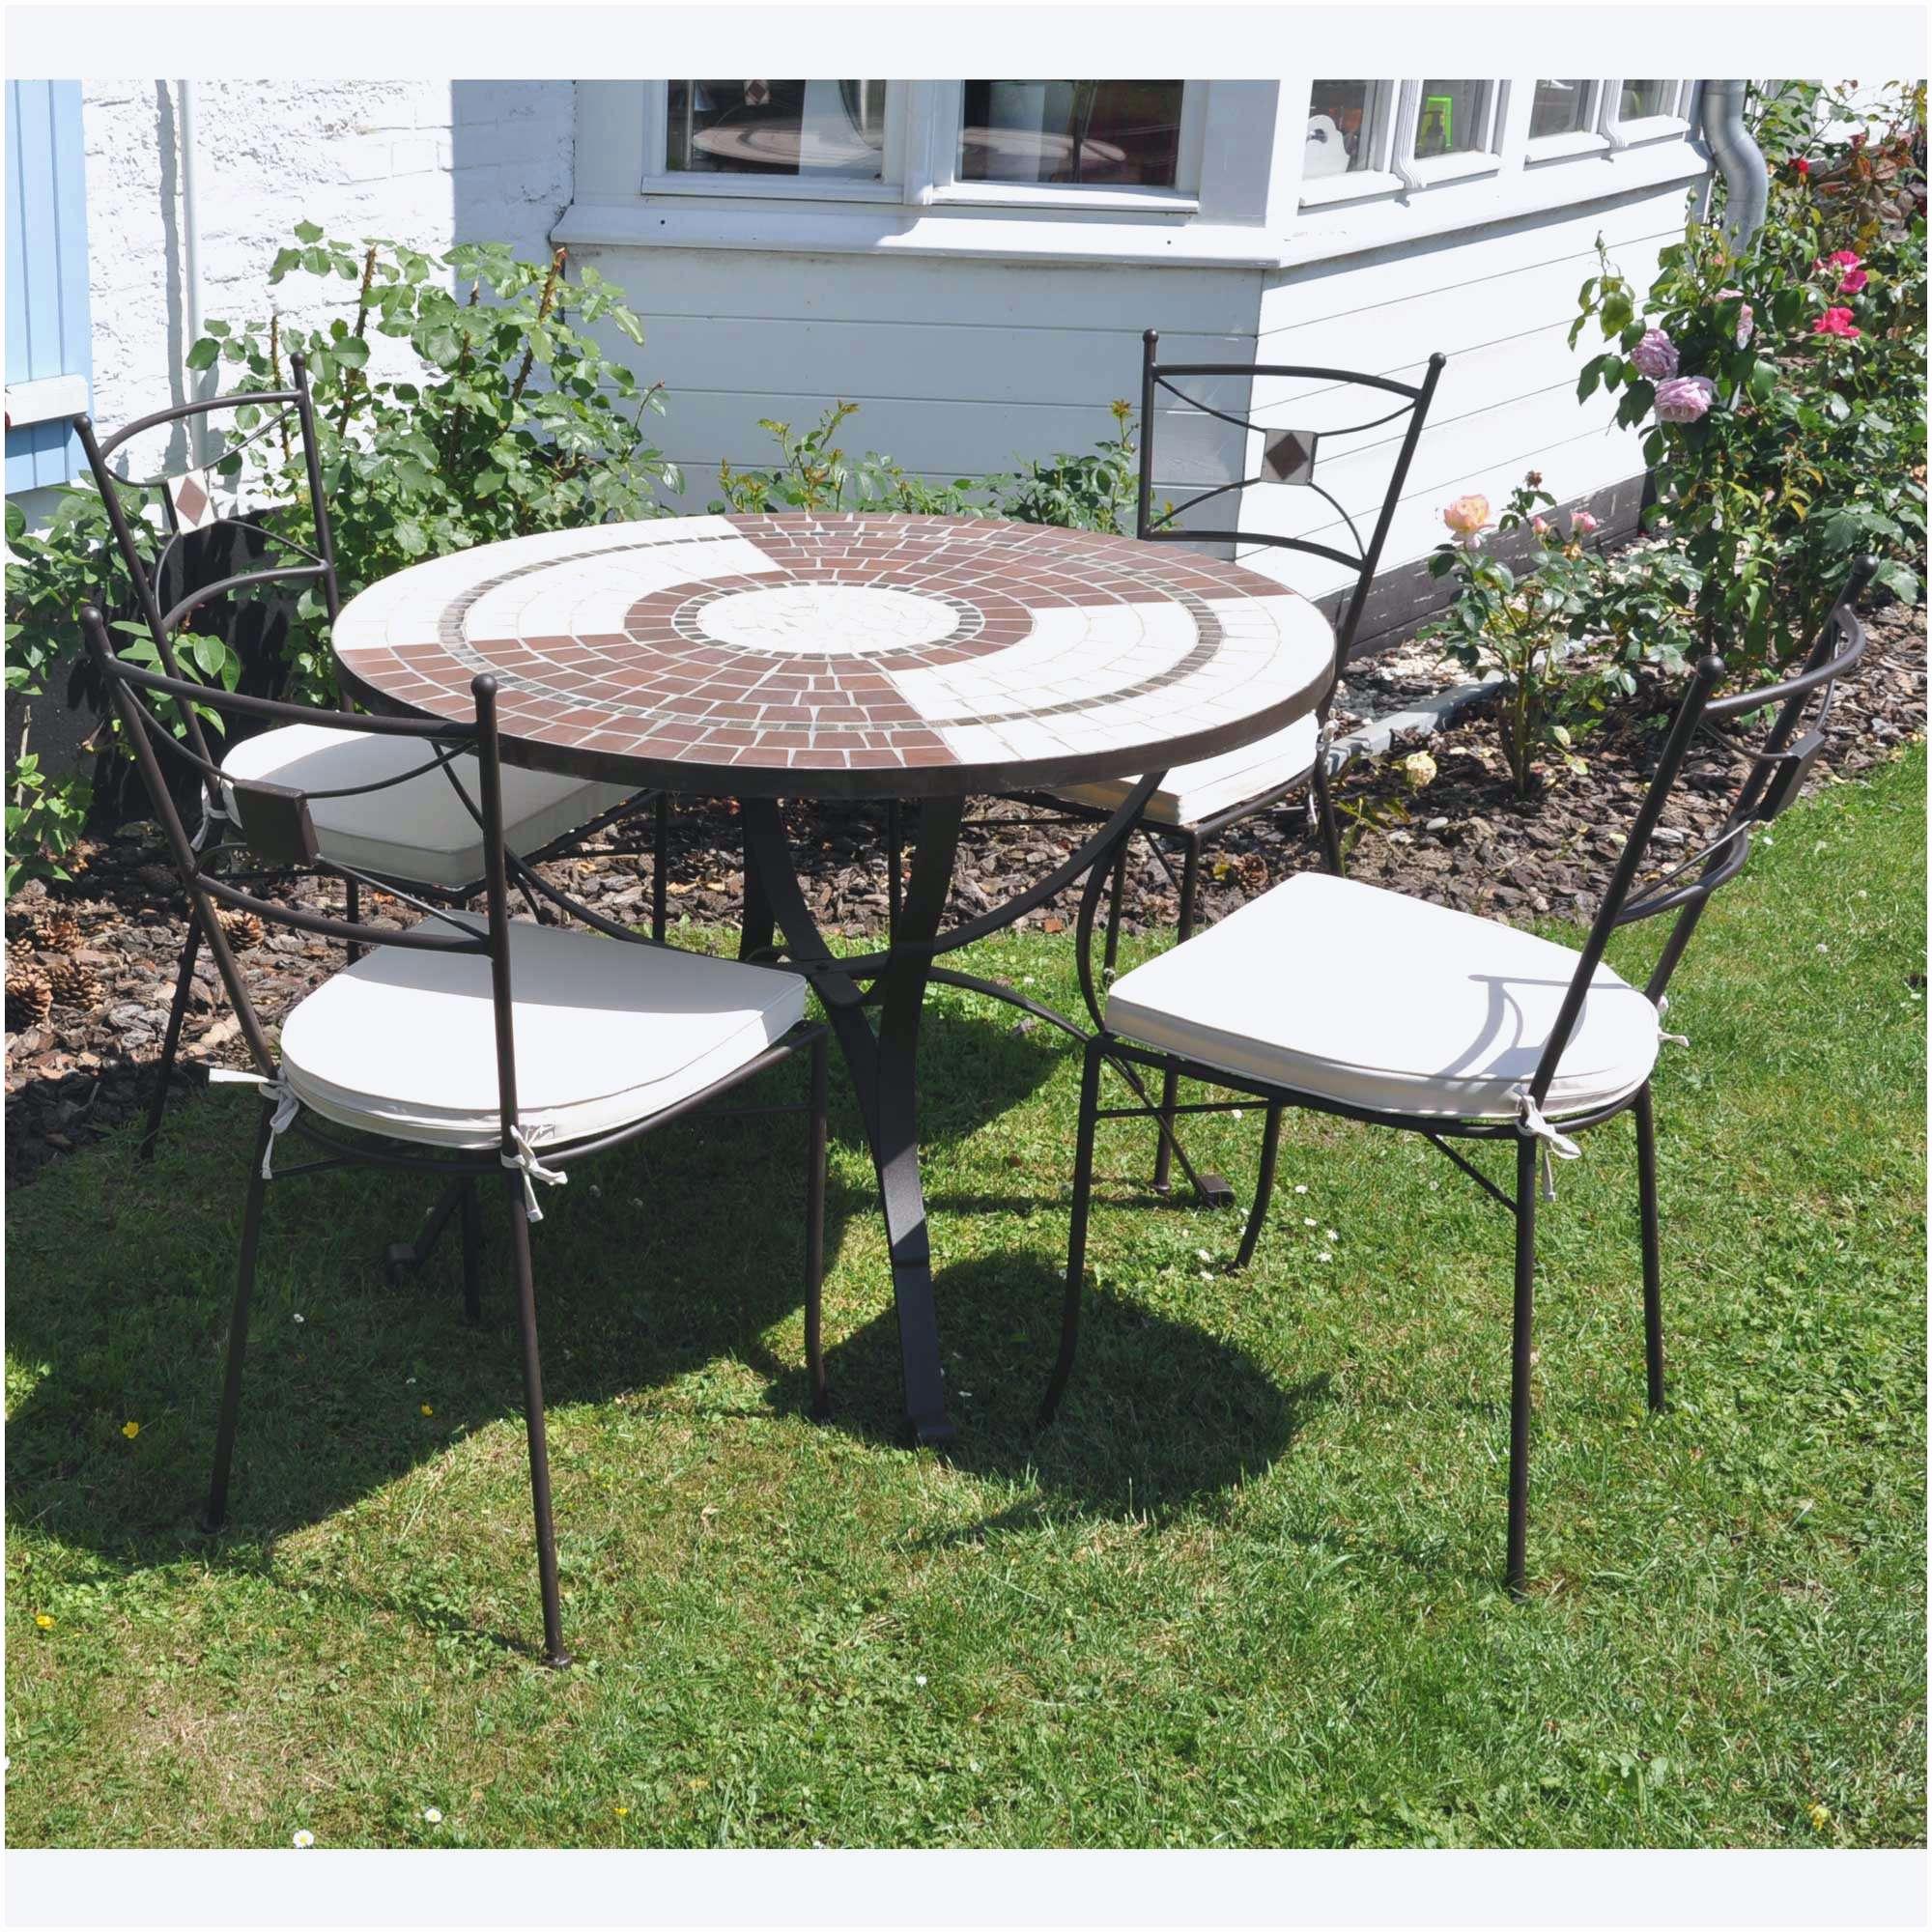 table jardin brico depot le meilleur de elegant table de jardin brico depot new table beton et bois beau of table jardin brico depot